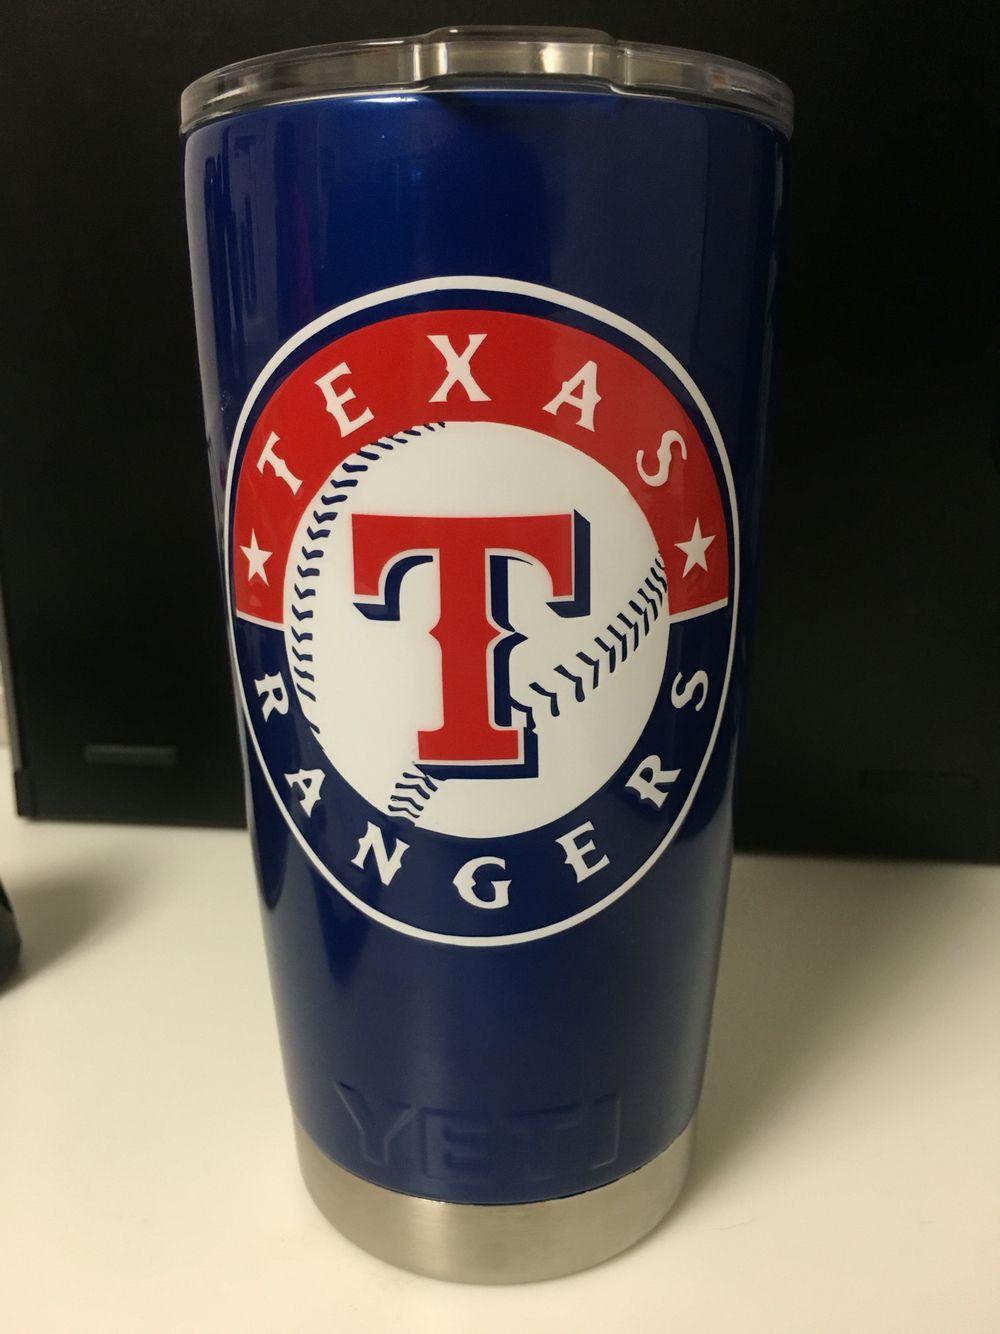 Texas Rangers Yeti Cup Mild2wildhydro Com Custom Cups Glitter Tumbler Cups Cup Design